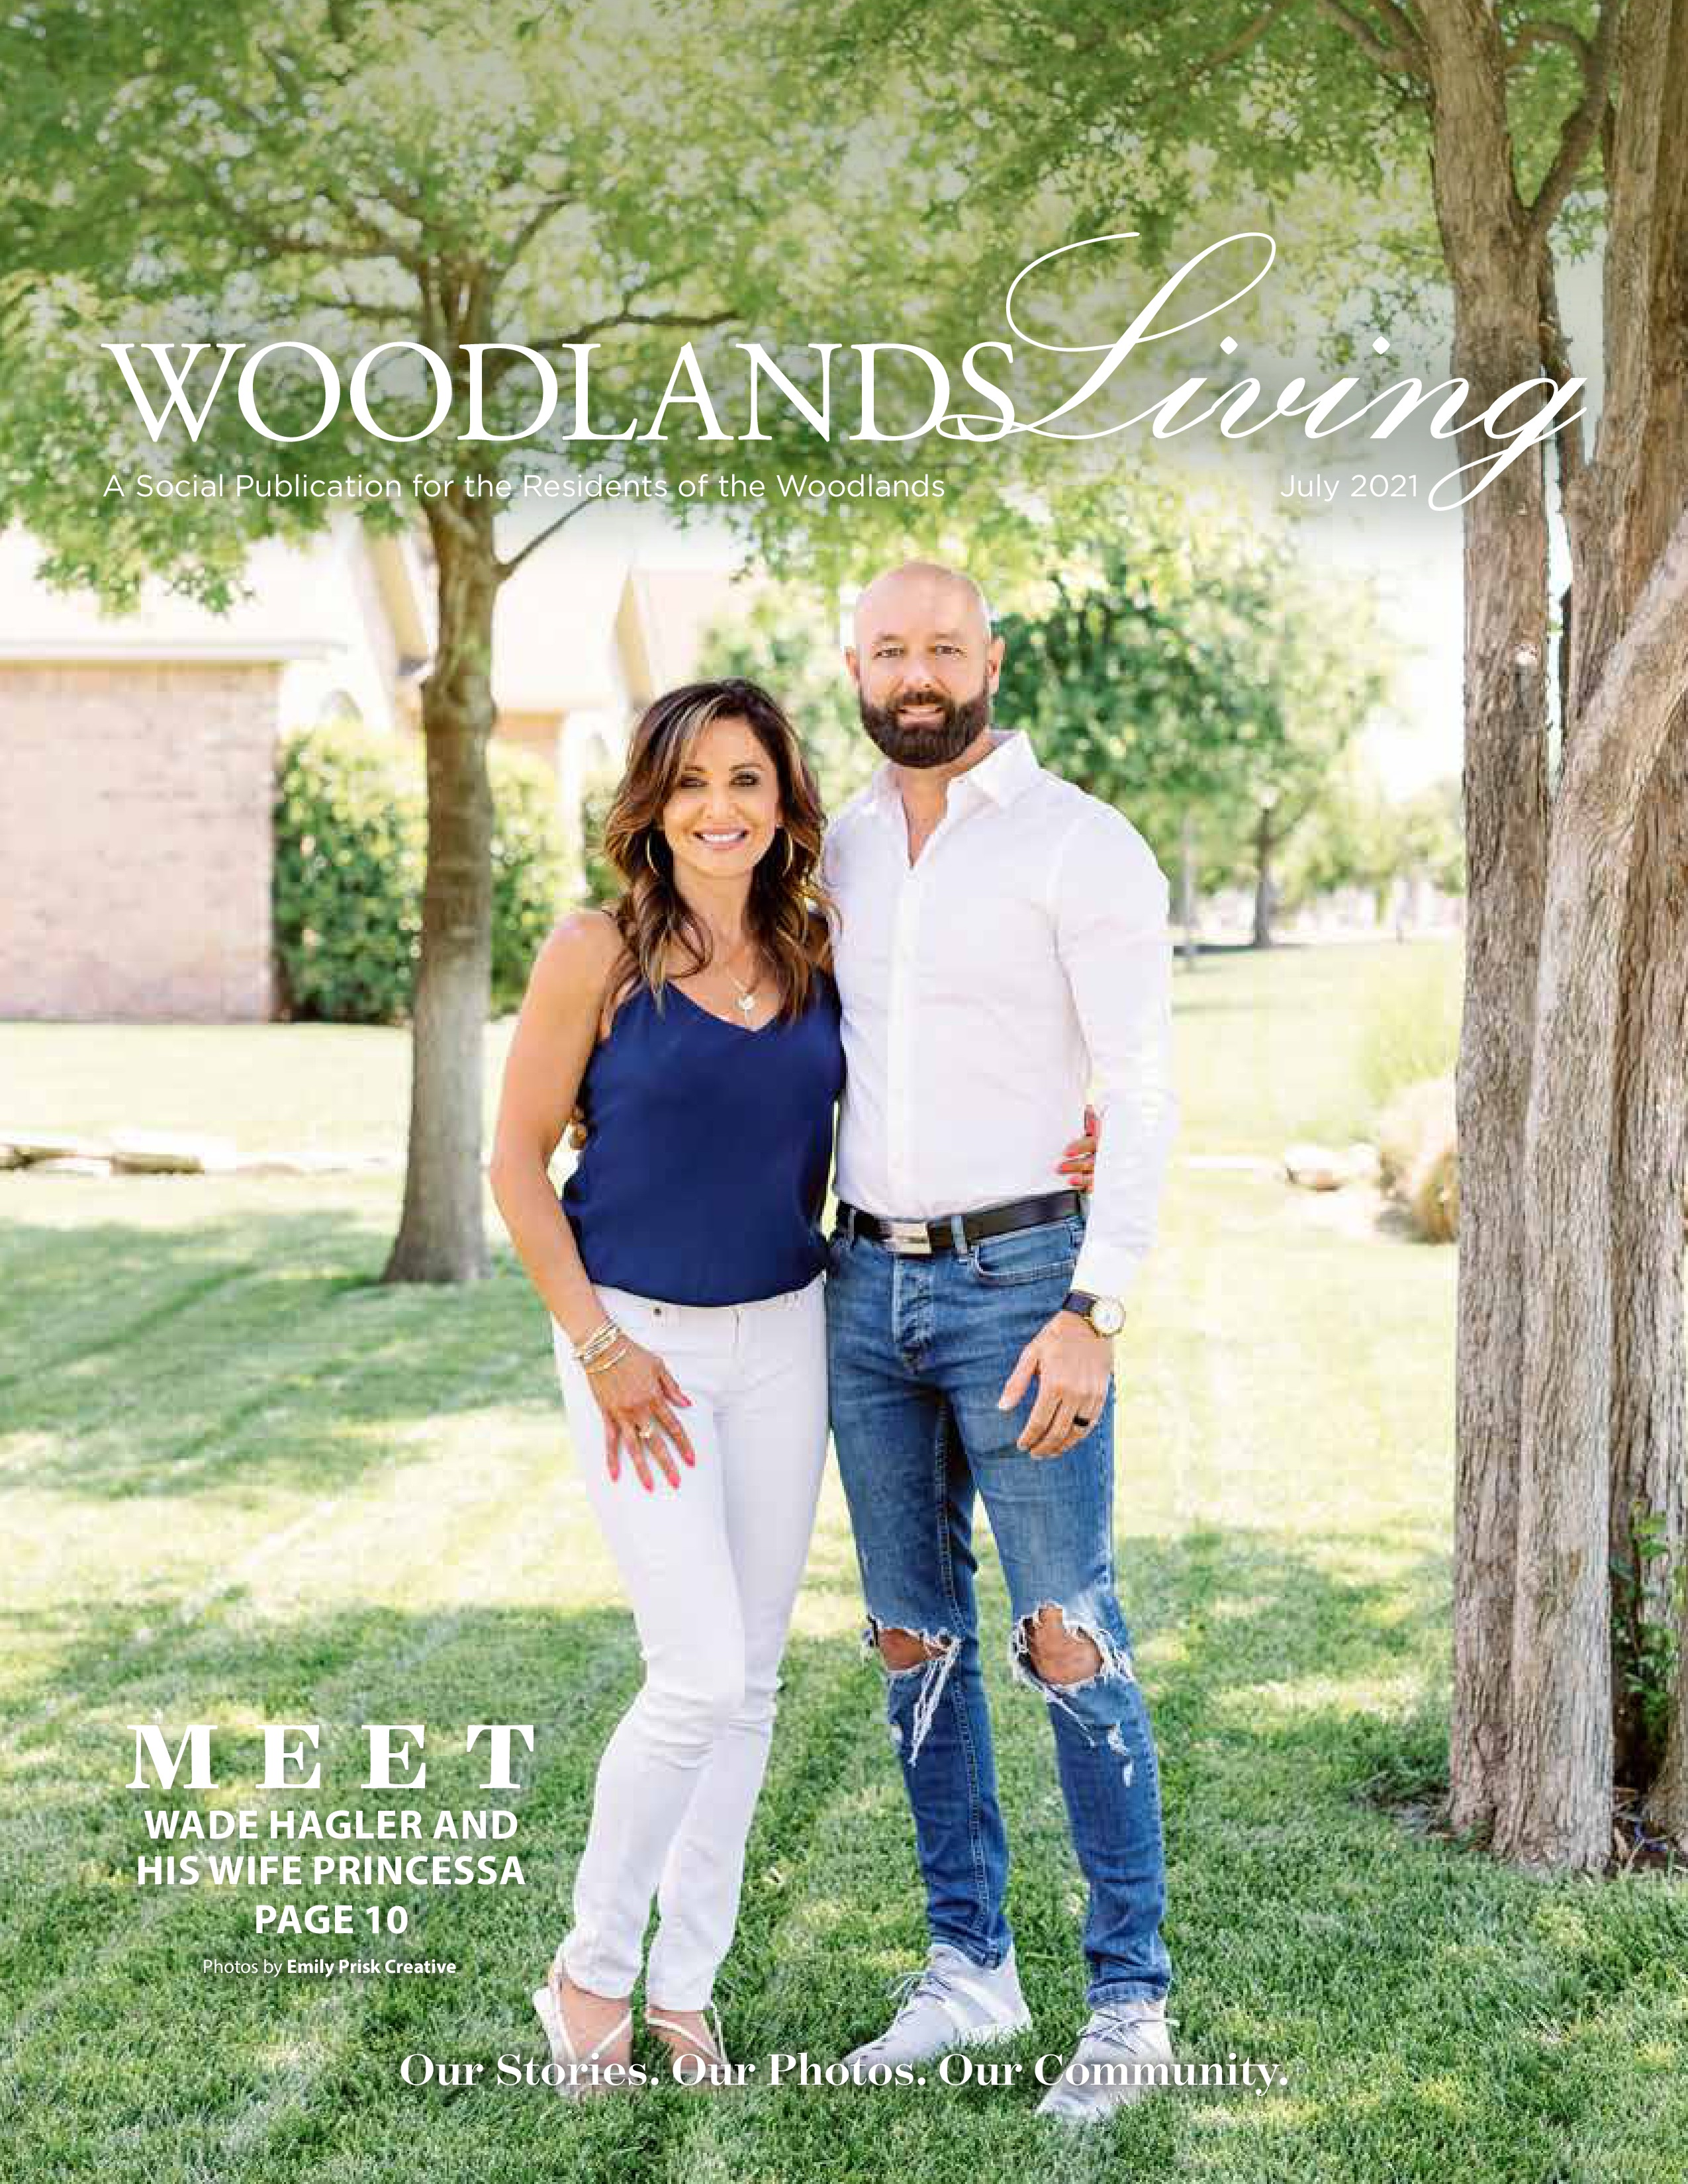 Woodlands Living 2021-07-01